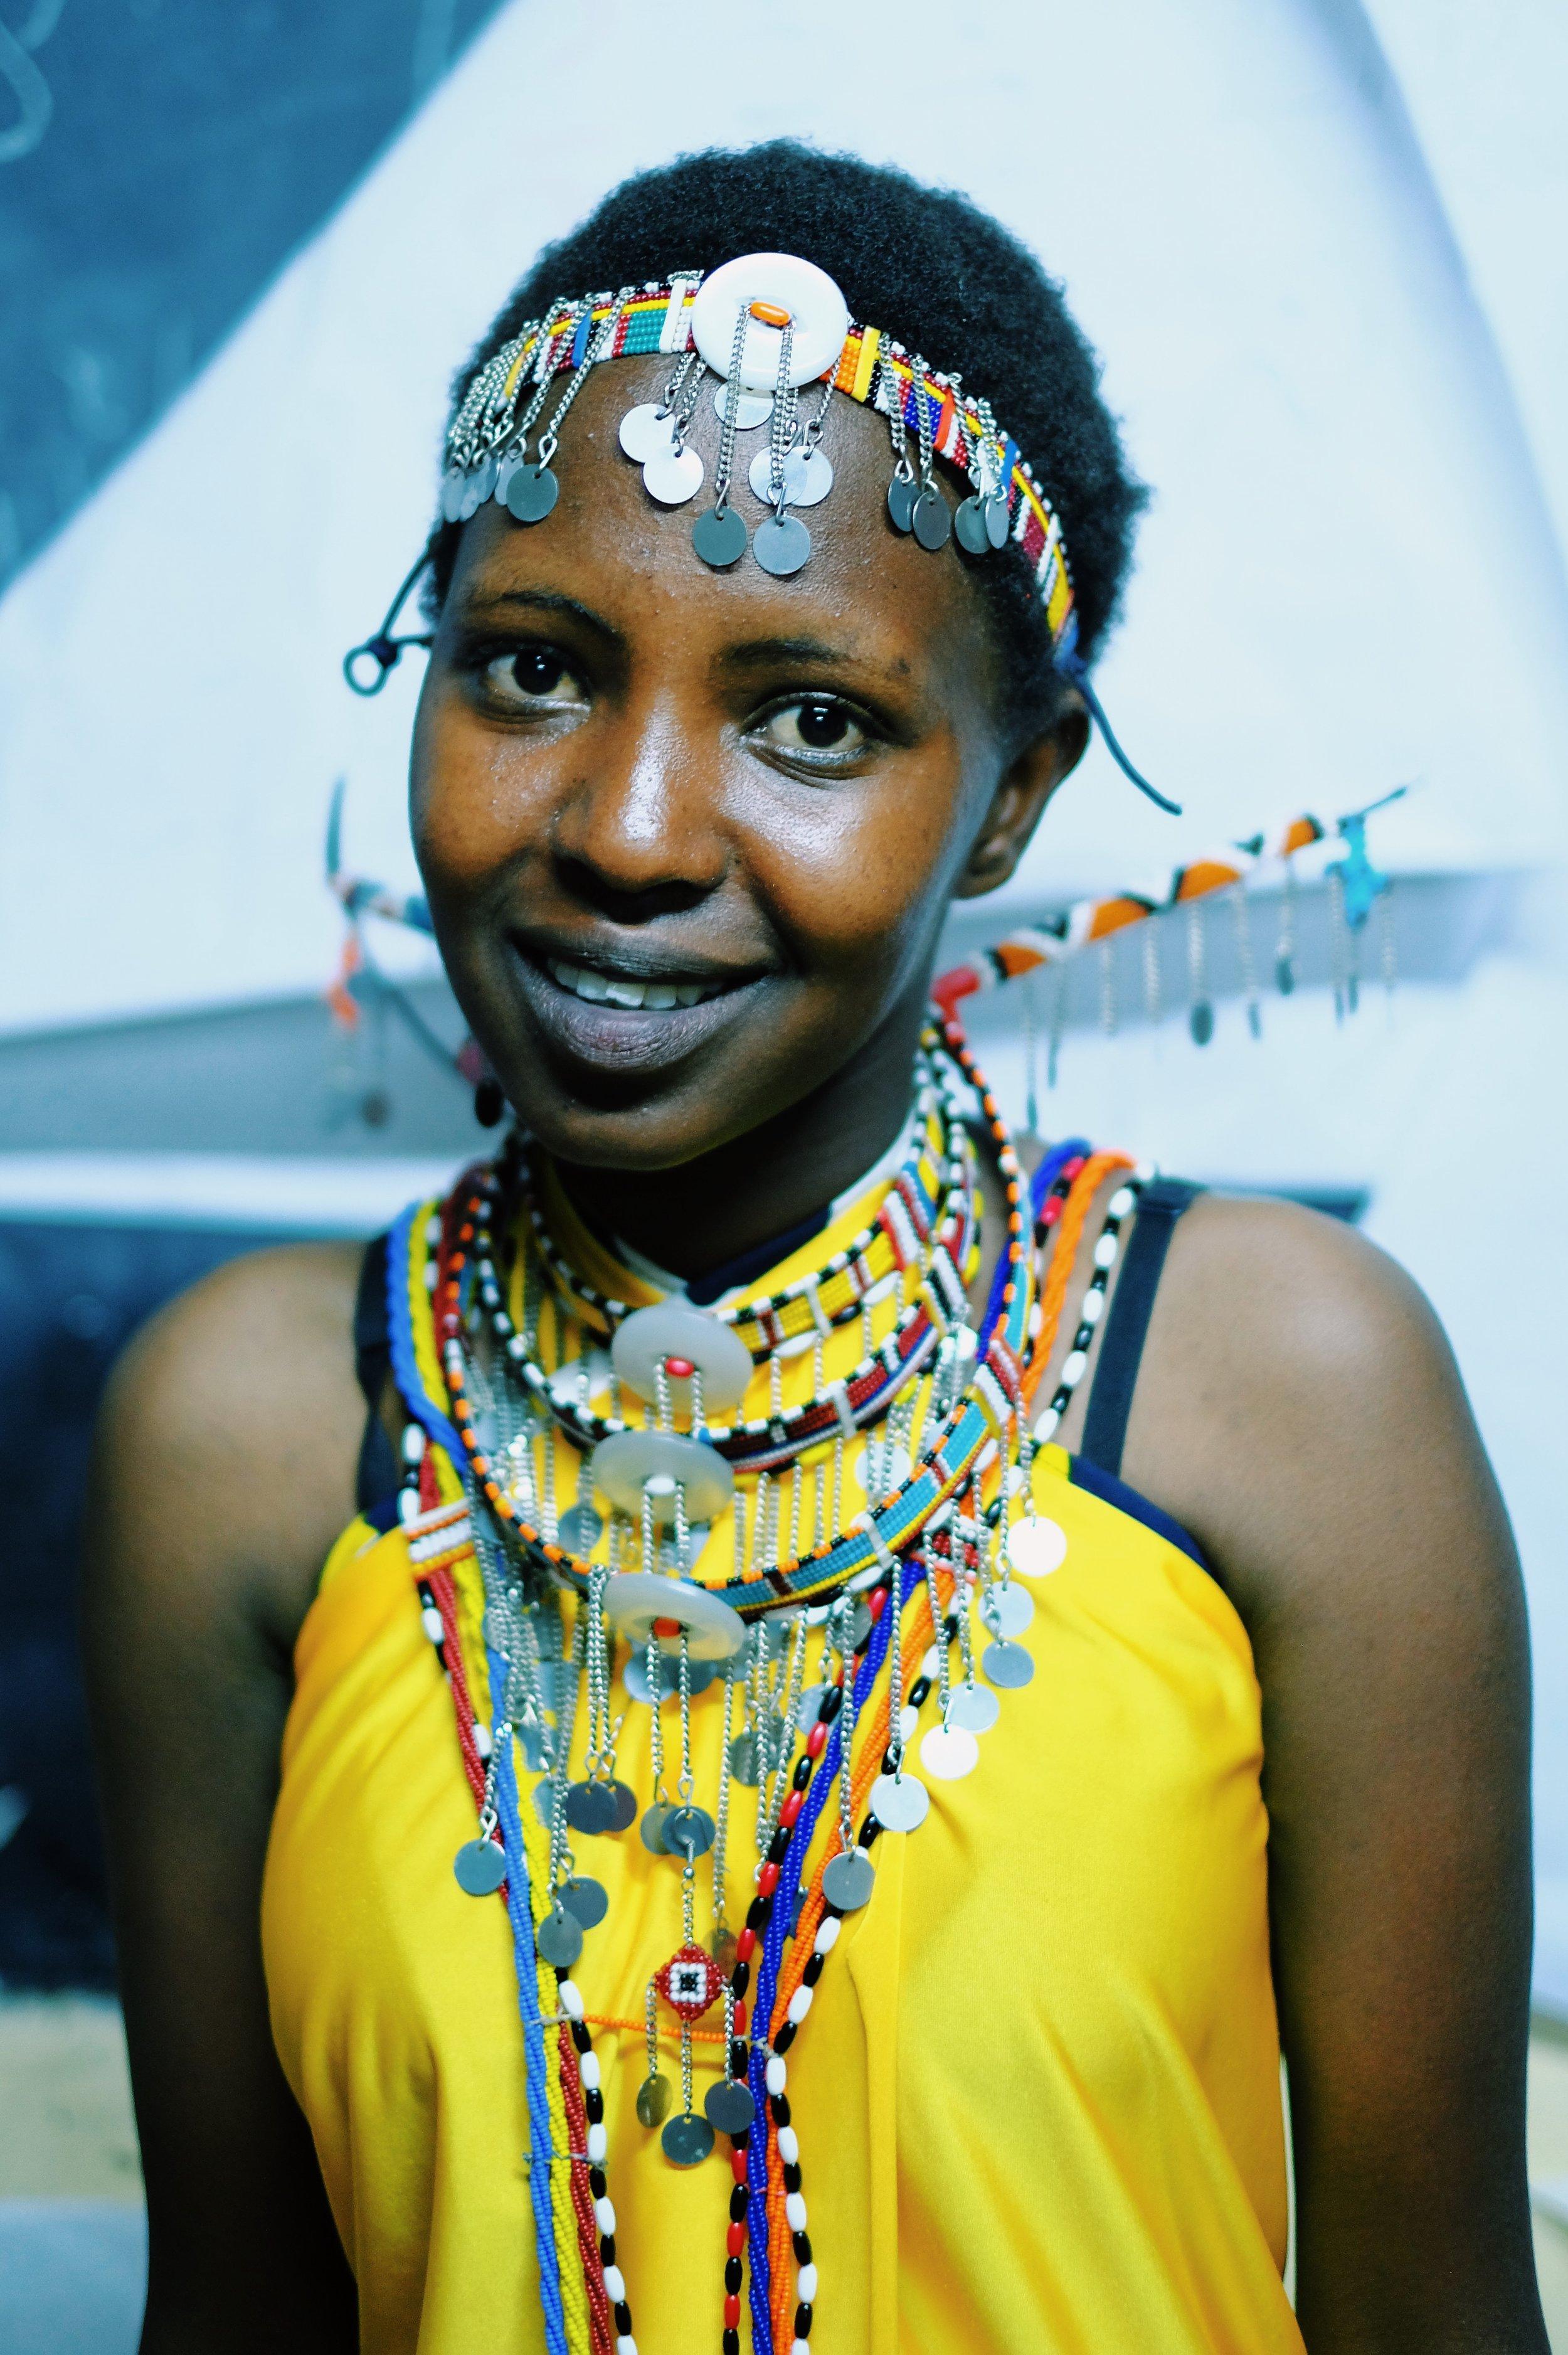 Maasai Olentoko 'End FGM' Beauty Pageant 8 by Joost Bastmeijer.jpeg